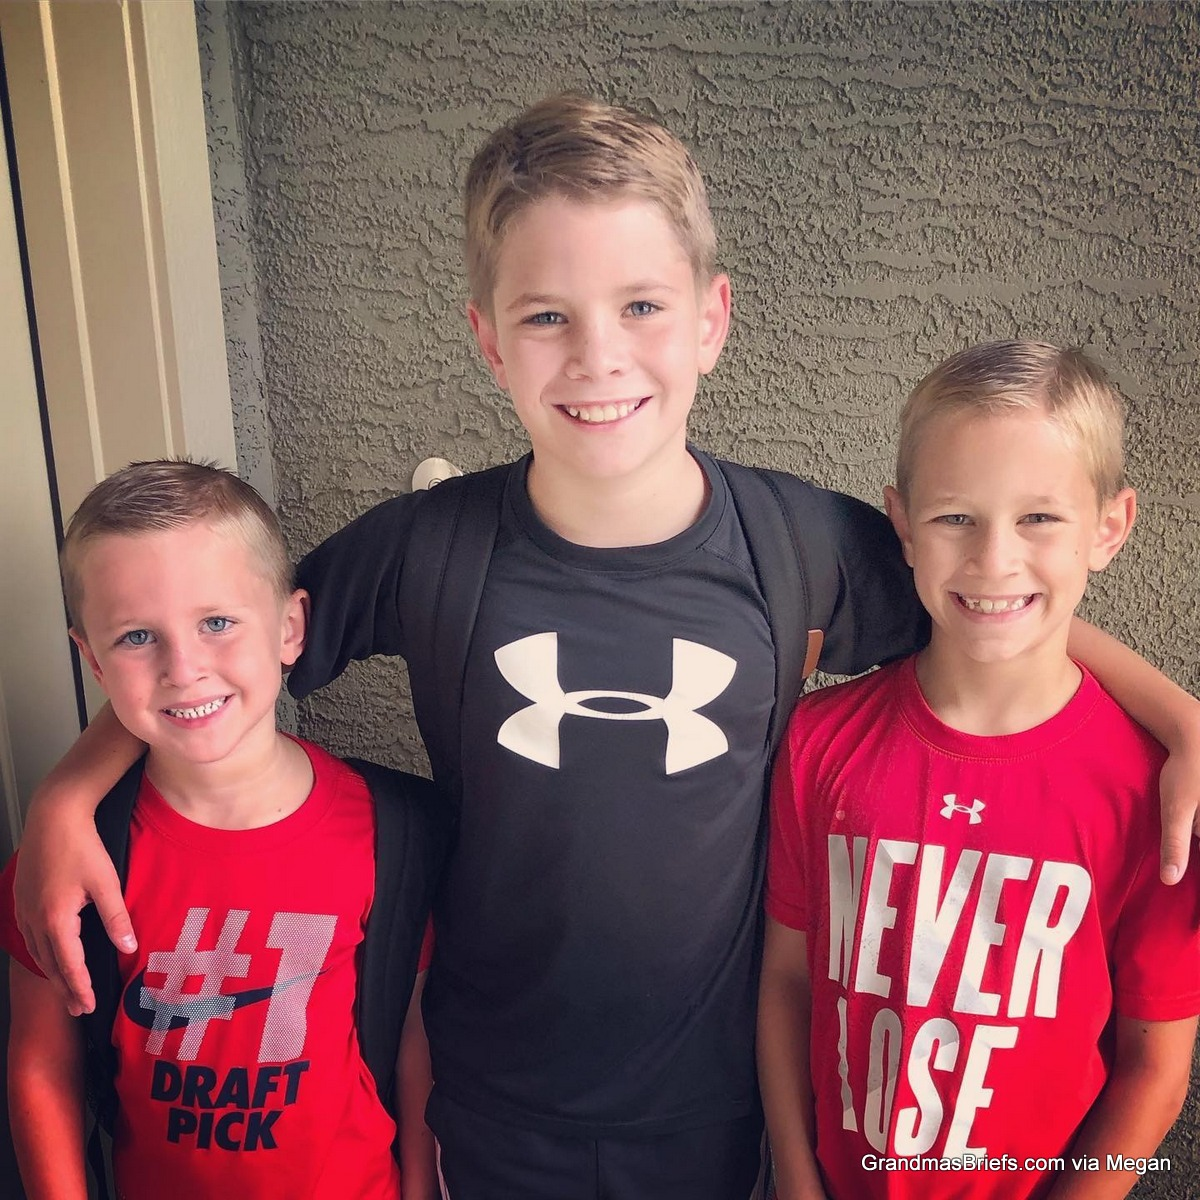 BTS 2019! Declan's first day of Pre-K, Brayden sixth grade and Camden second grade